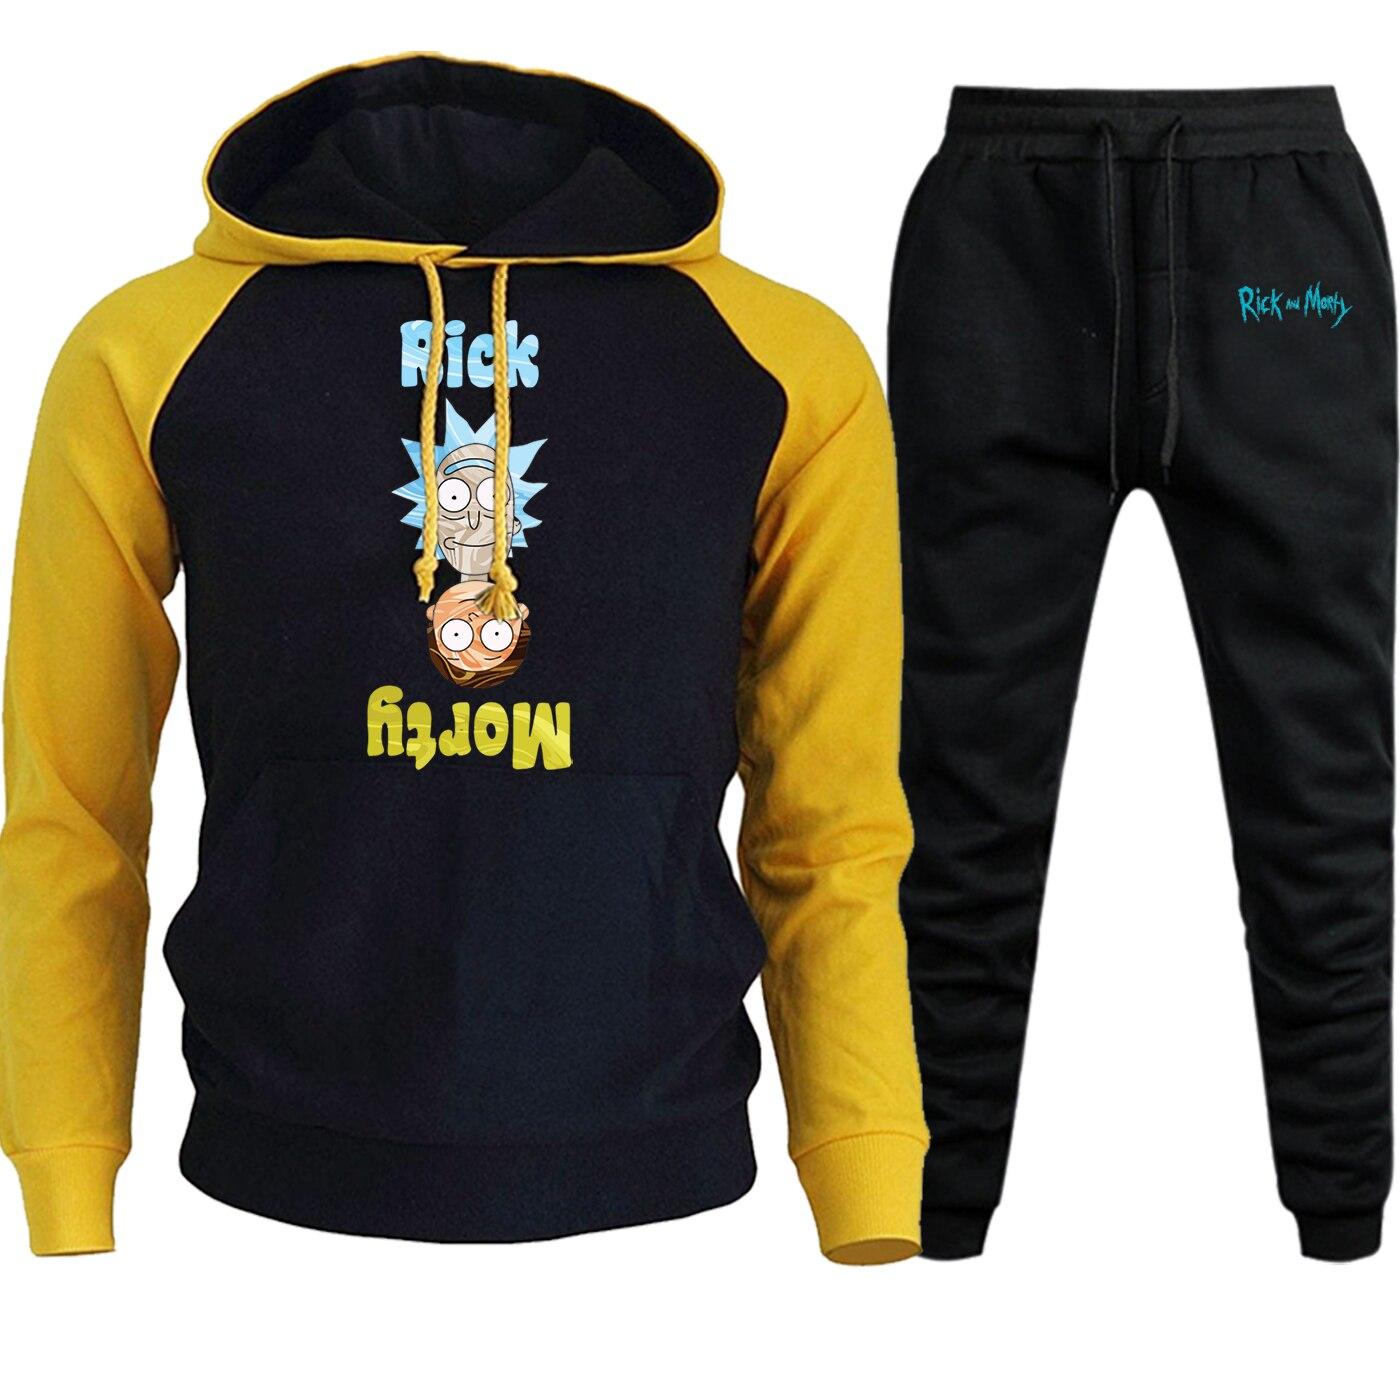 Rick And Morty Streetwear Hoodies Raglan Mens Suit Autumn Winter 2019 New Cartoon Funny Pullover Hip Hop Hoody+Pants 2 Piece Set